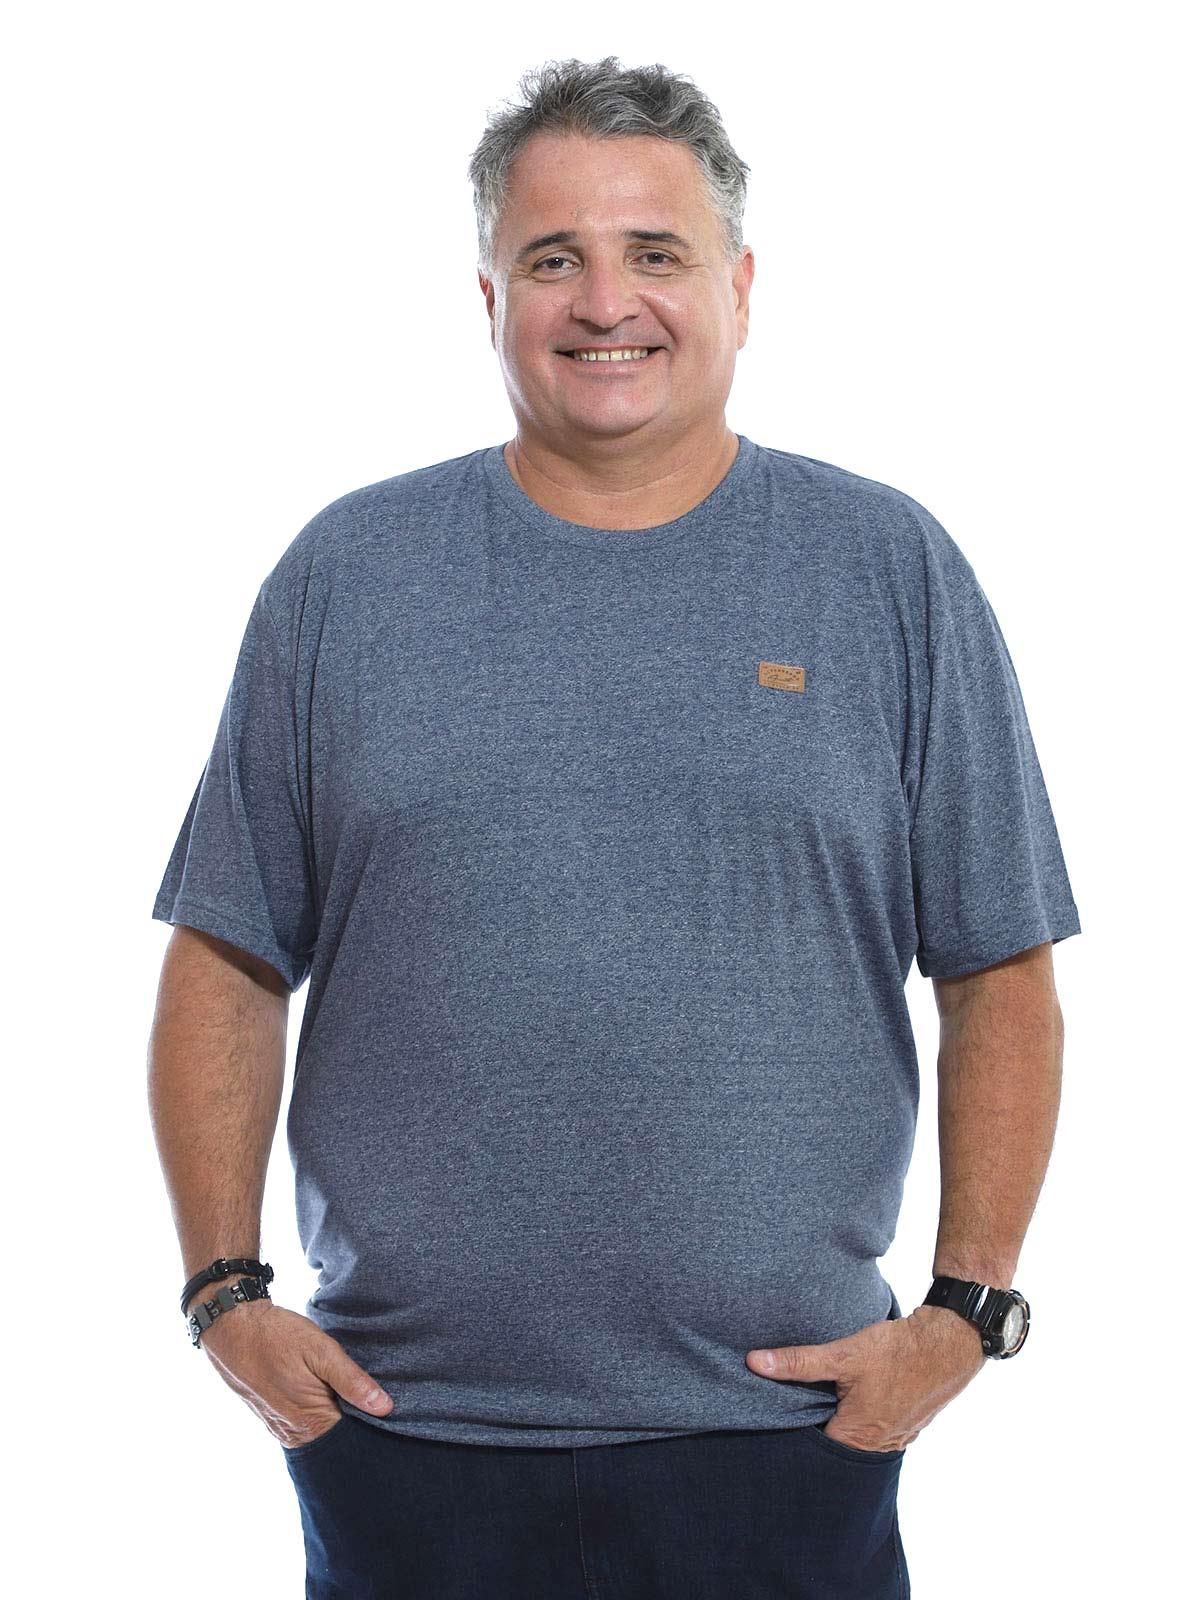 Camiseta Plus Size Anistia Mouline Ultra Fine Mescla Marinho